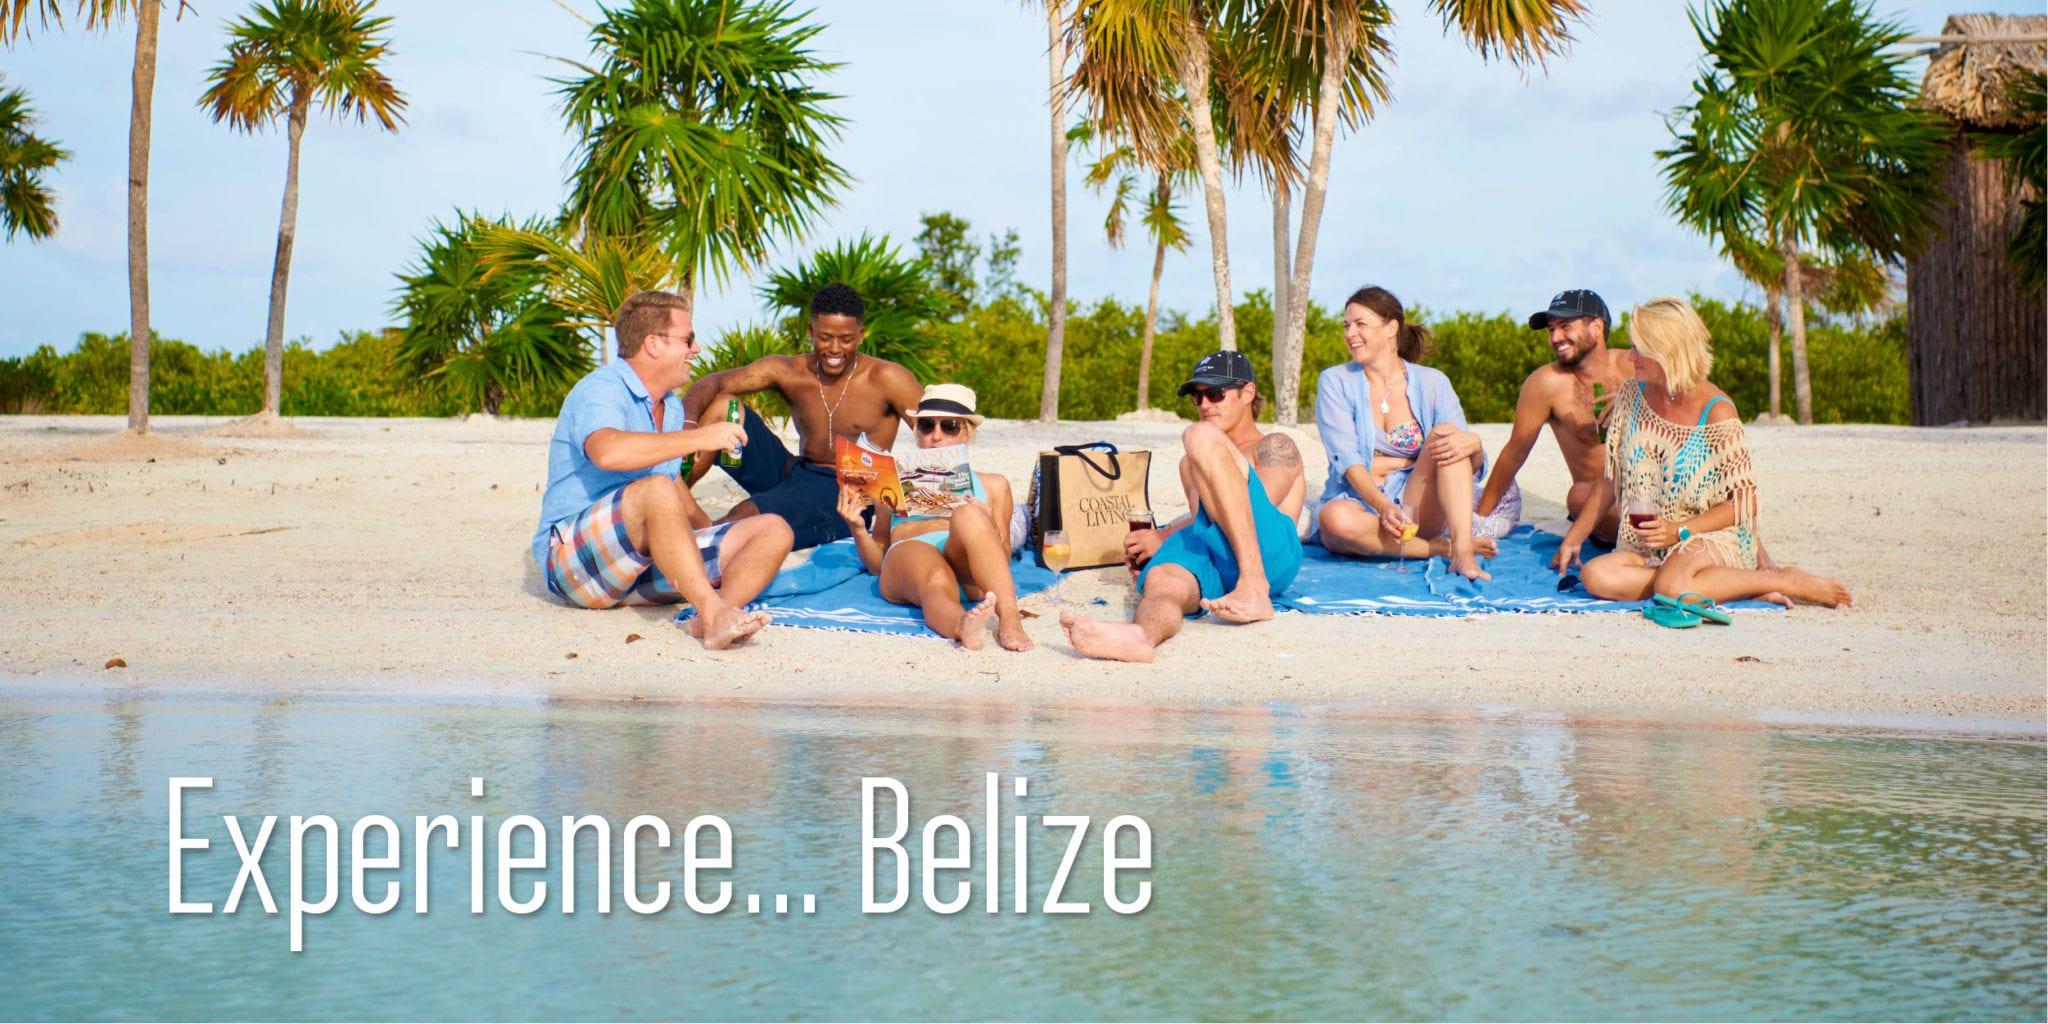 acb4b35a6f95c Caribbean Culture, LIfestyle, McNab Visual, Belize, Travel; Caribbean ...